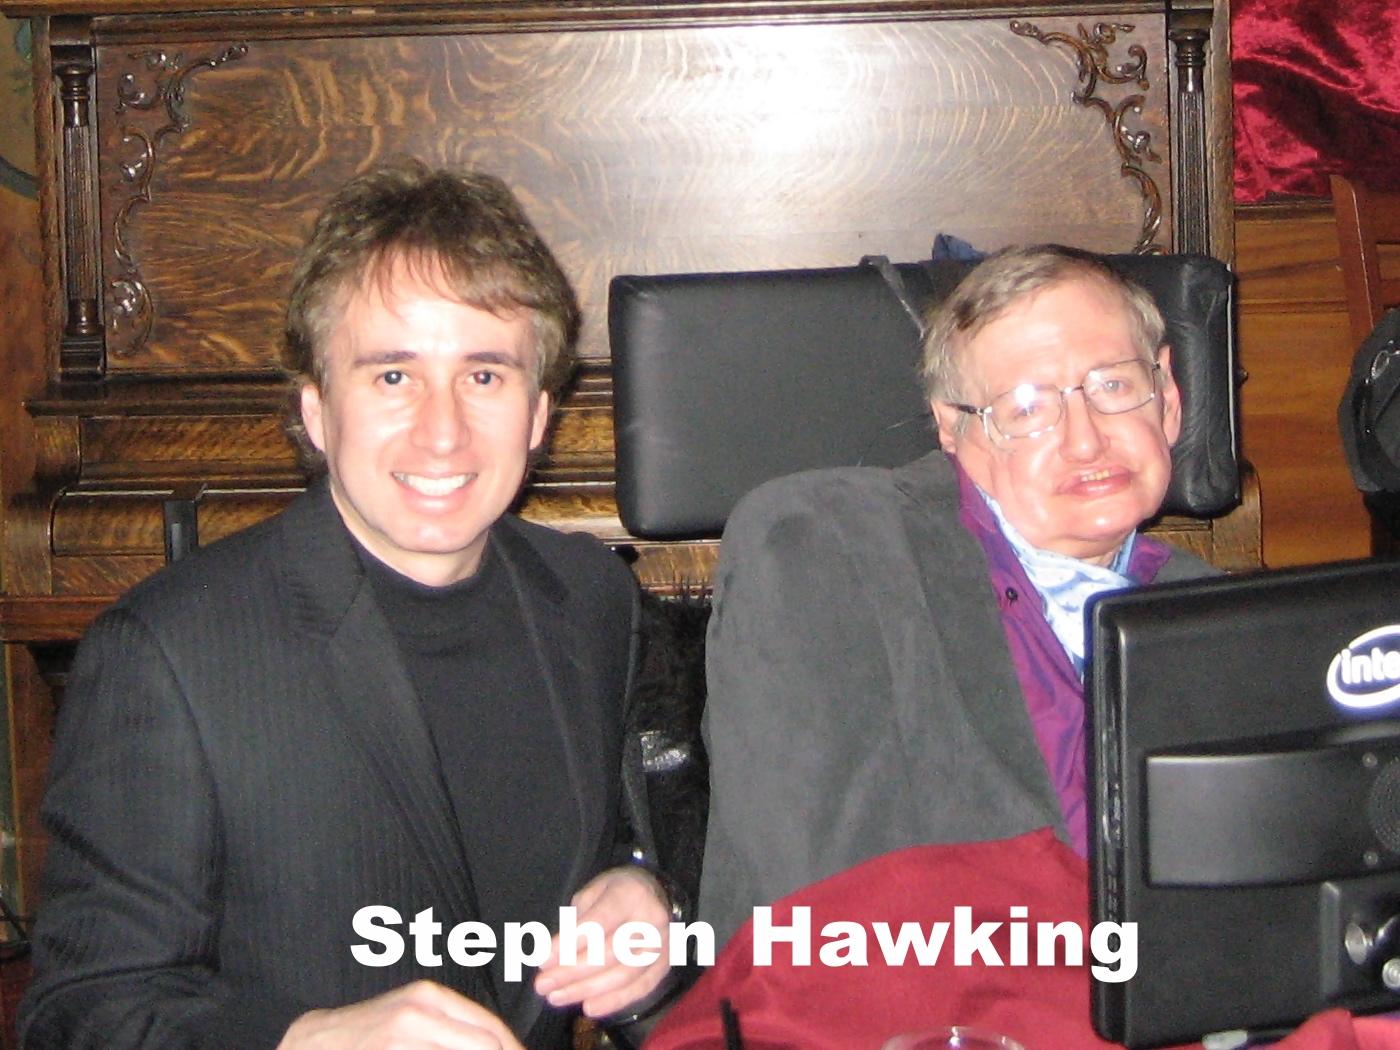 Stephen Hawking with magician Lou Serrano